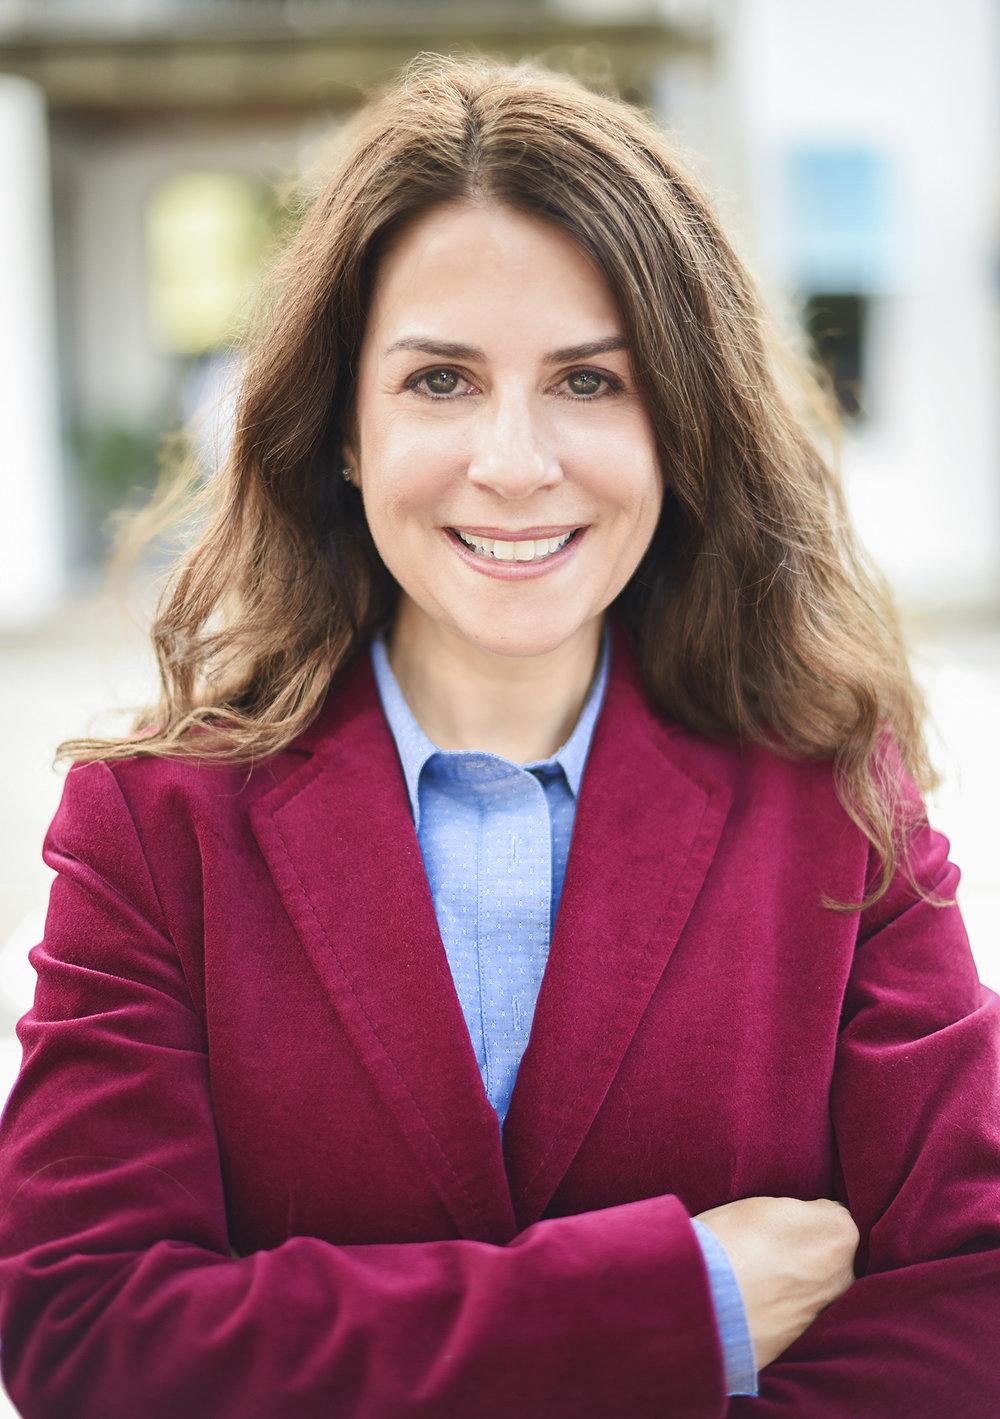 Dr. Amanda VanDerHayden of Spring Math